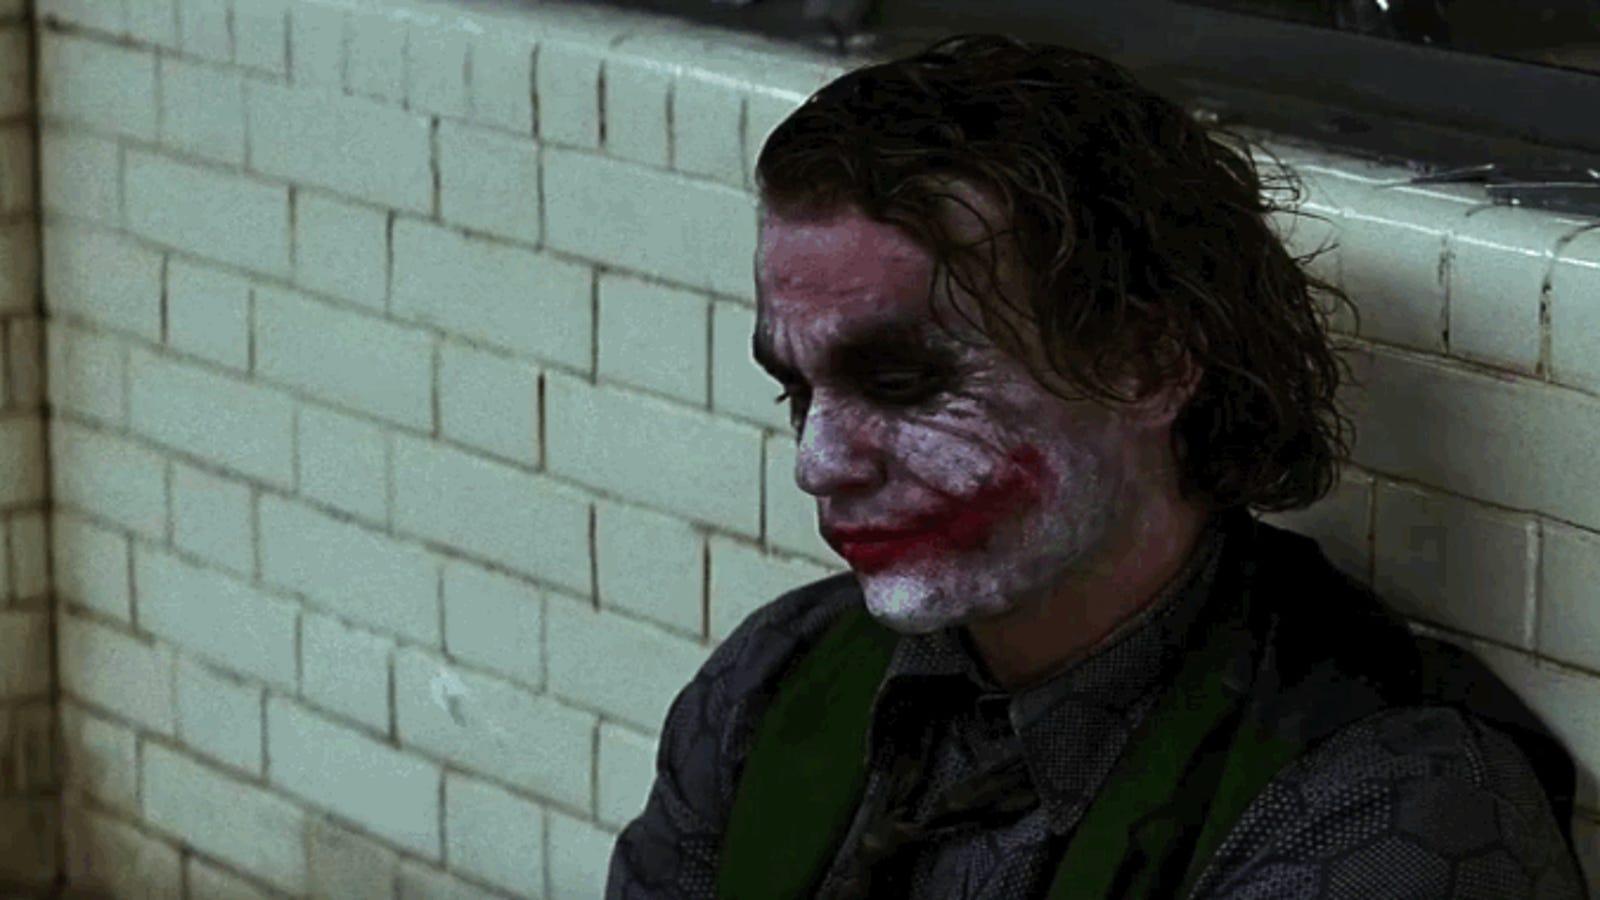 10 detalles ocultos detrás de populares personajes de película